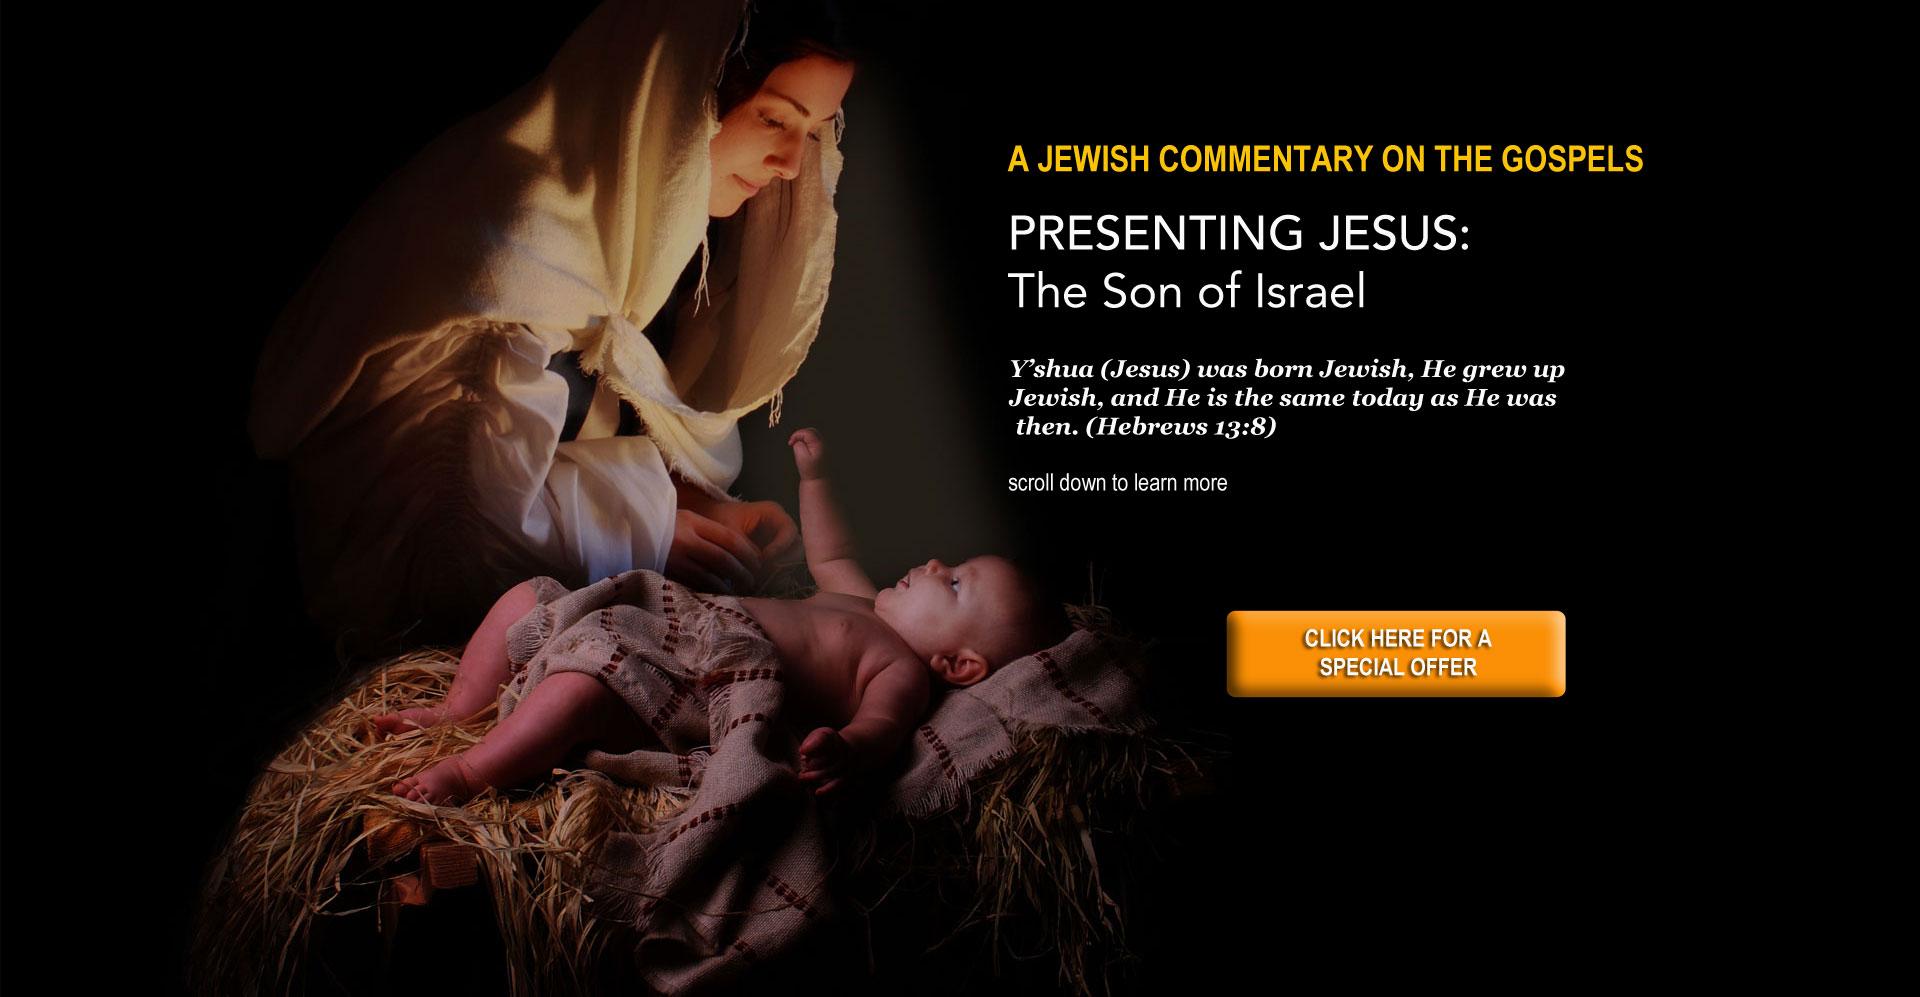 Presenting Jesus